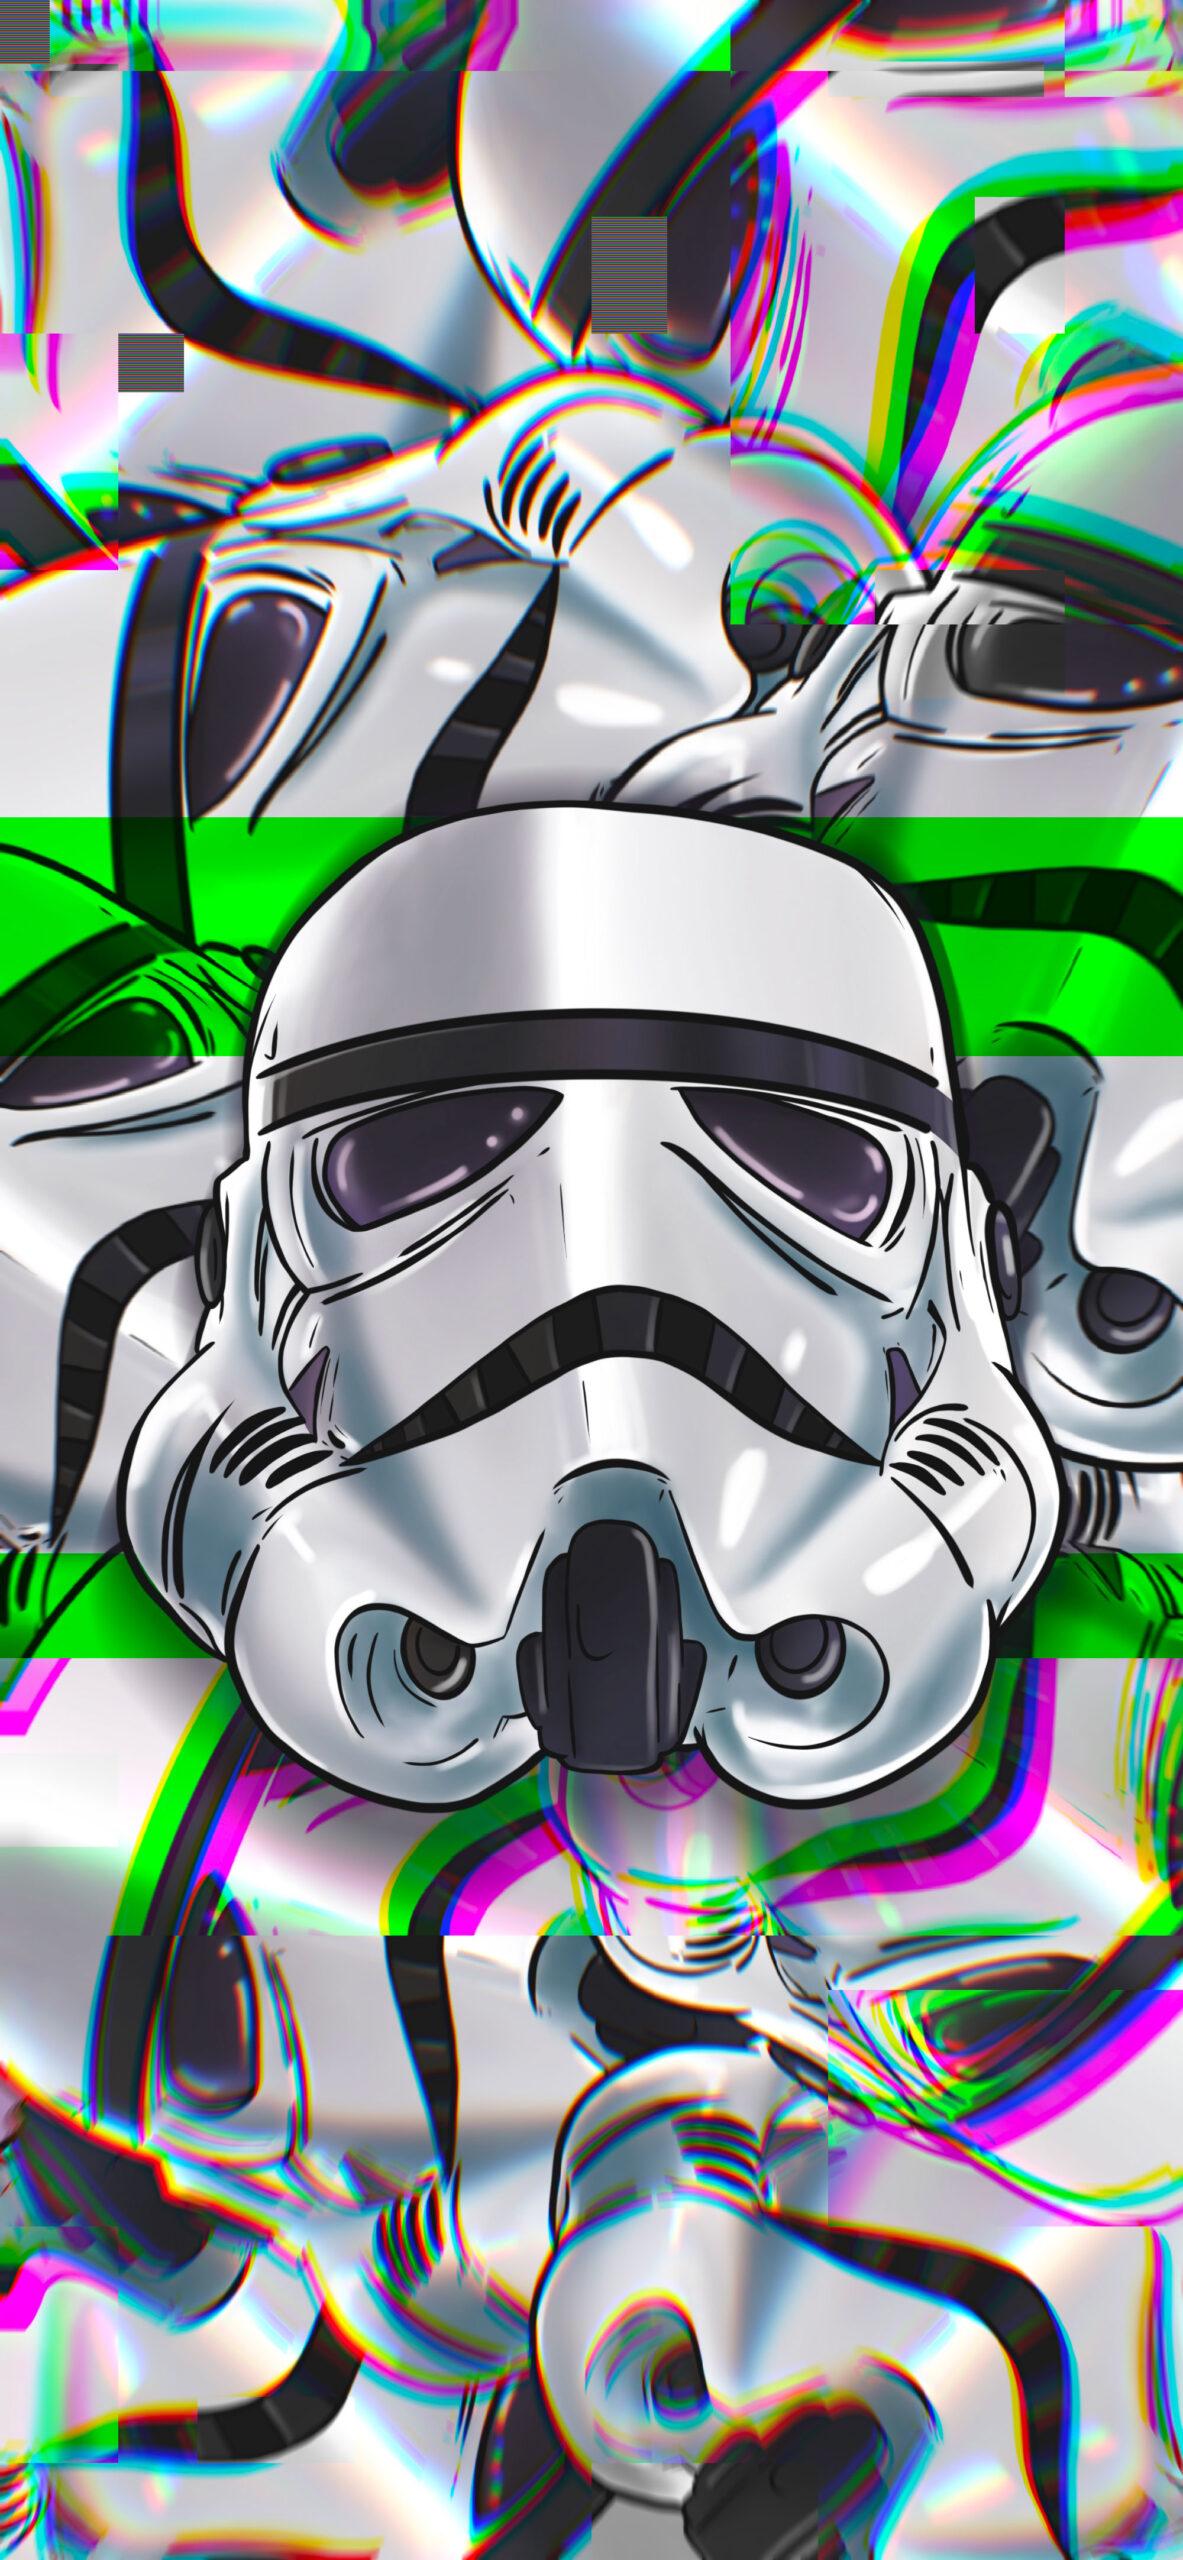 star wars stormtrooper helmet glitch wallpaper